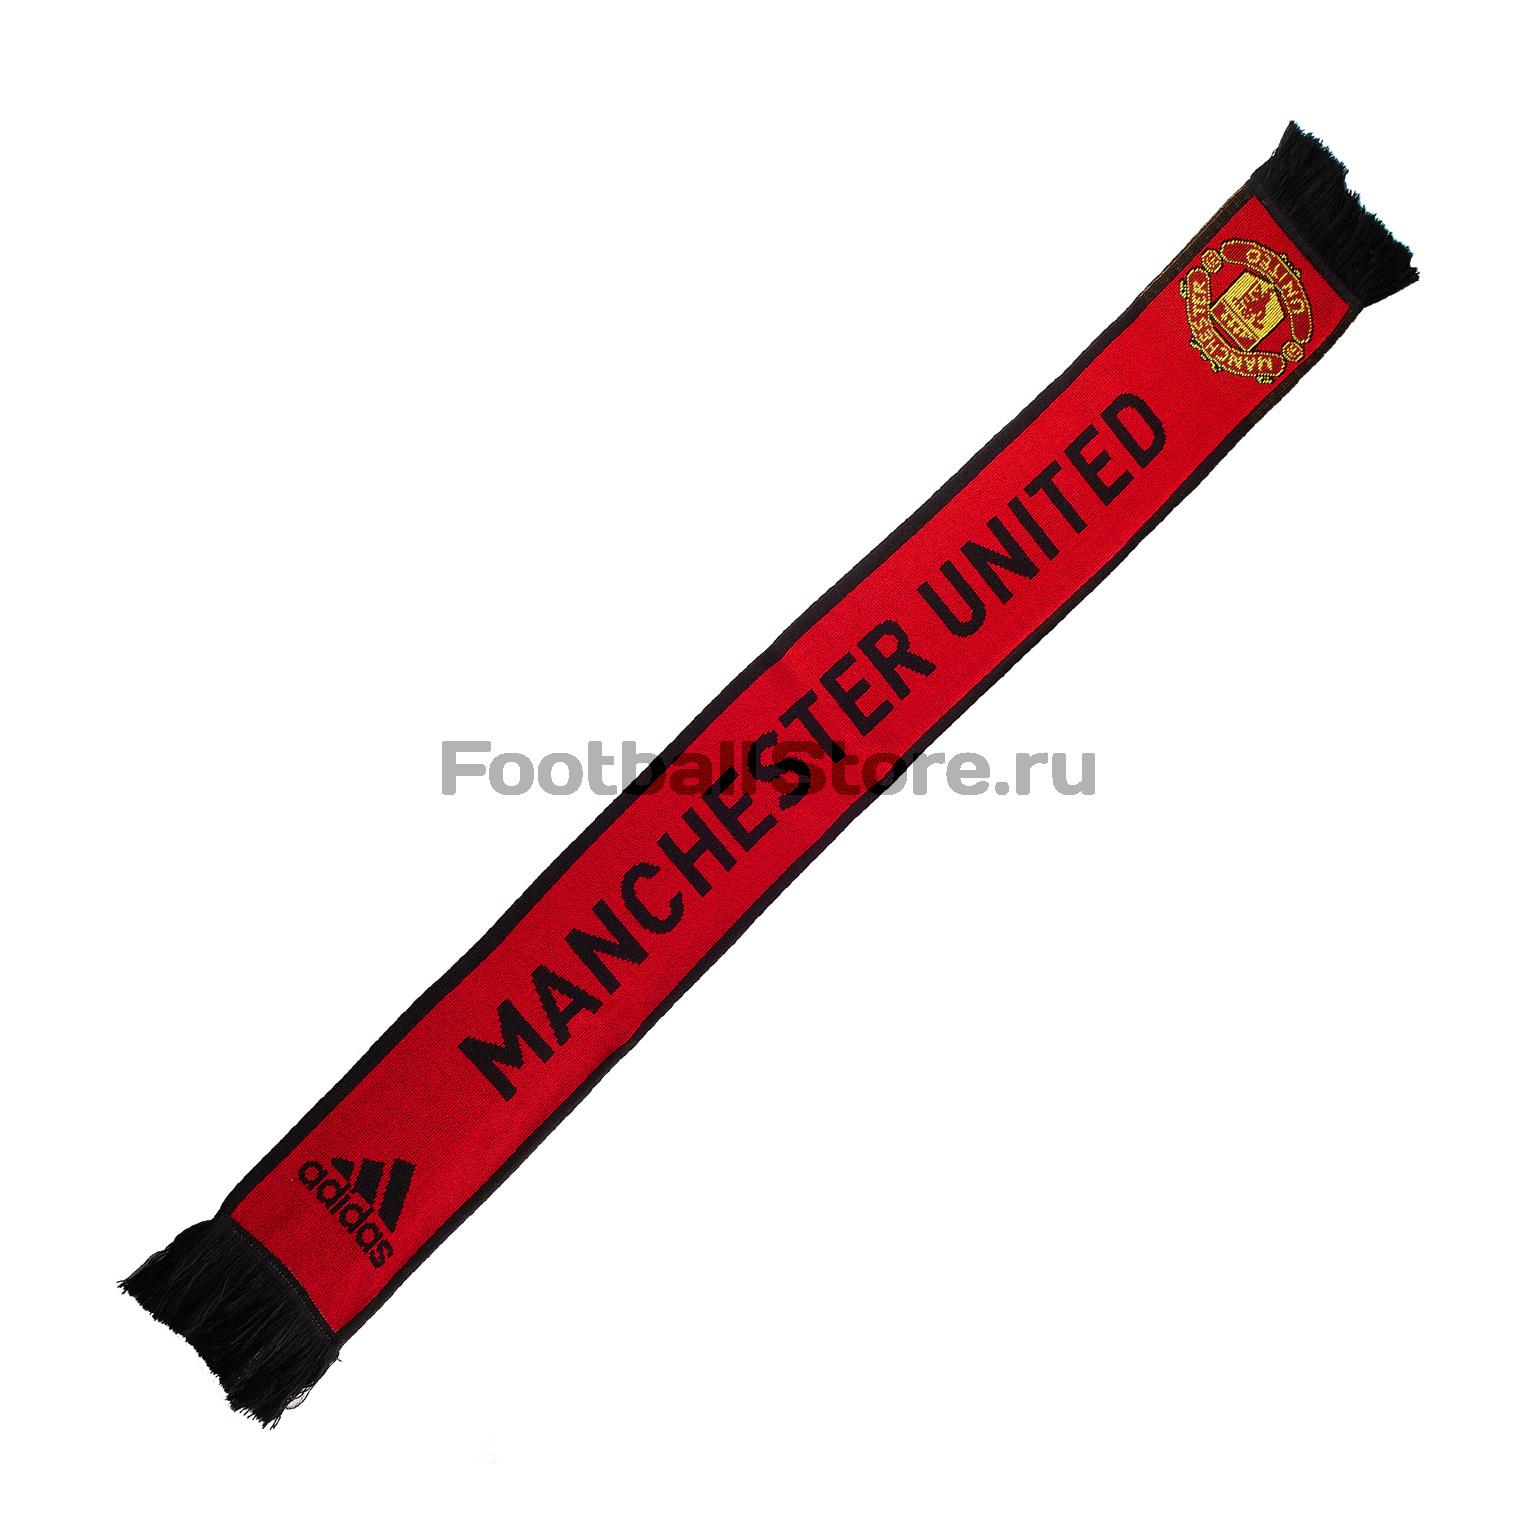 Шарф болельщика Adidas Manchester United Scarf CY5578